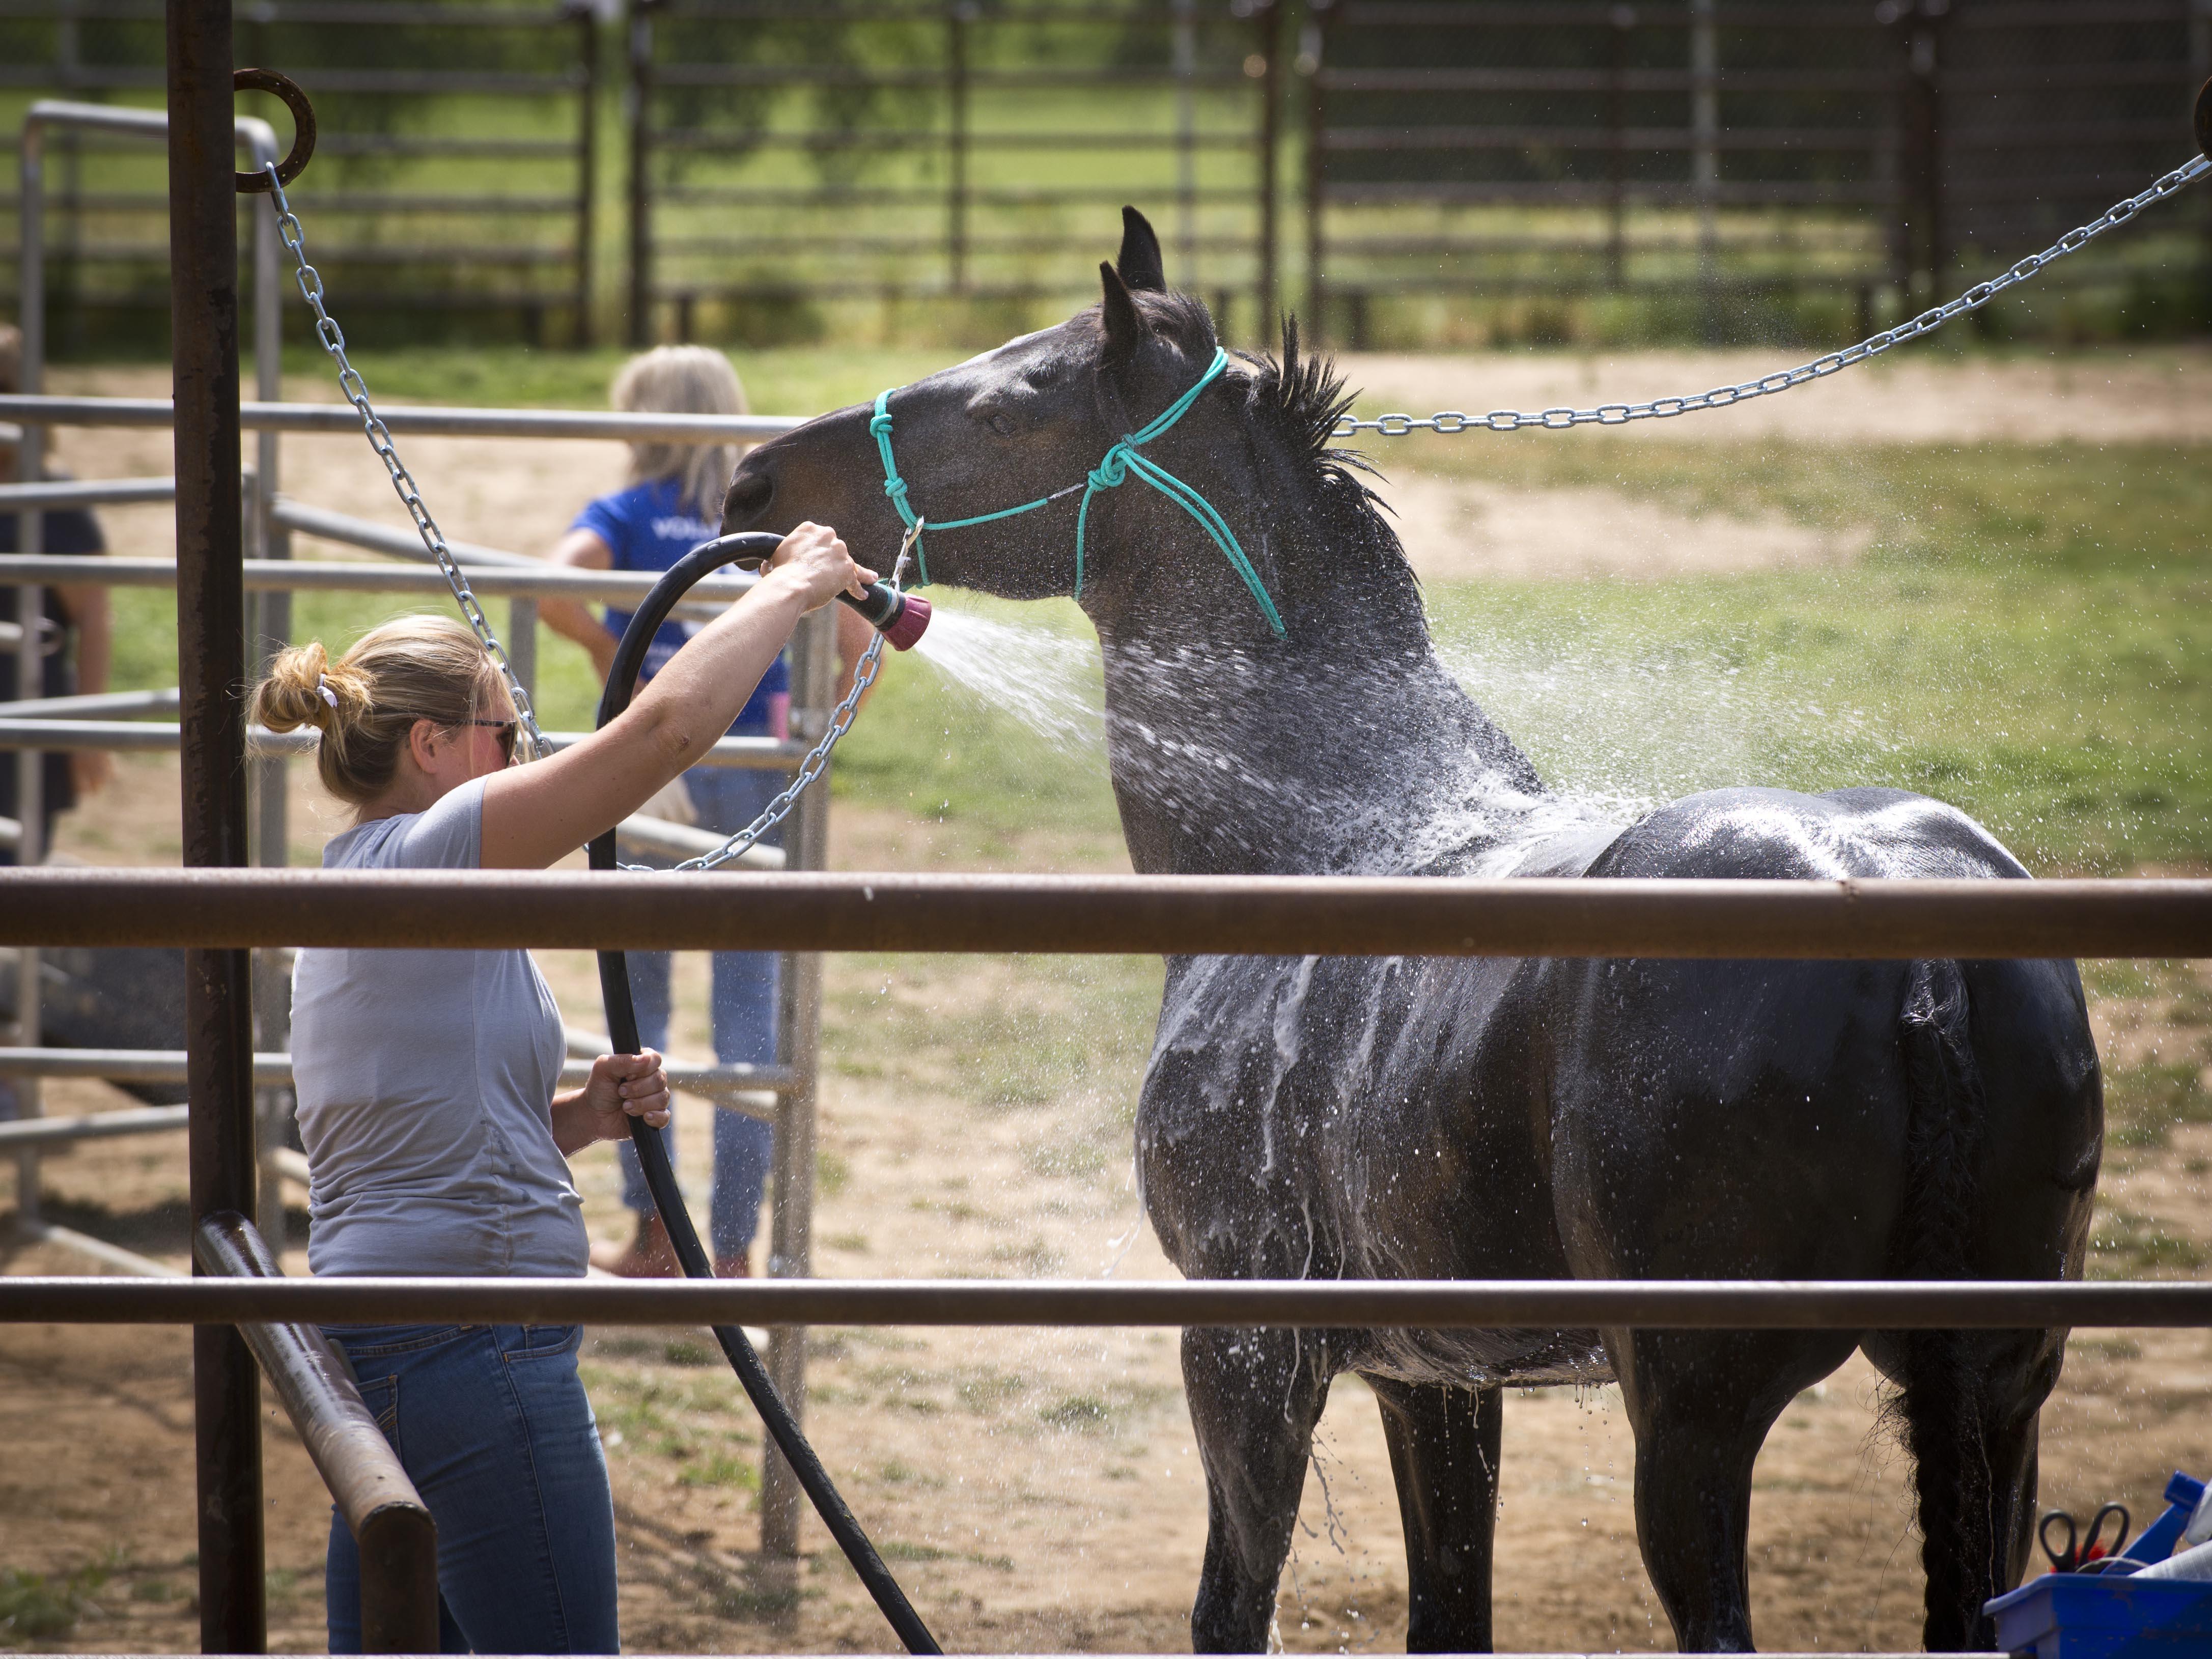 Horse_Wash04.jpg